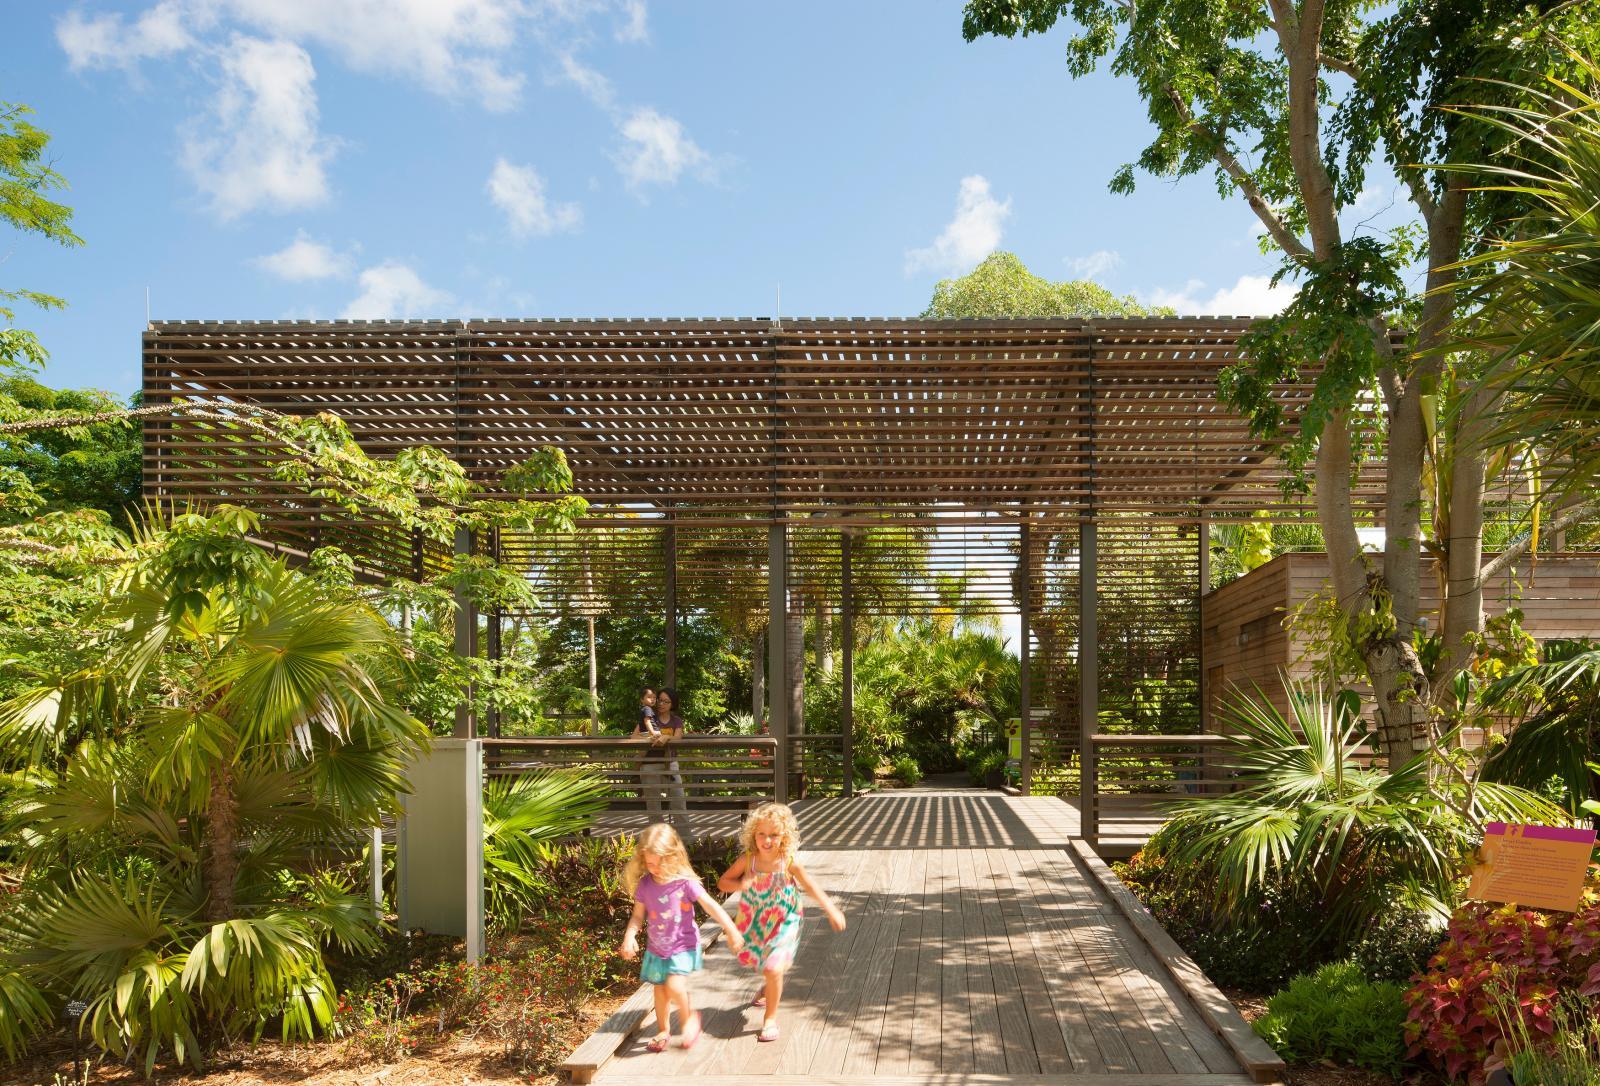 Naples Botanical Garden Visitor Center Lake Flato